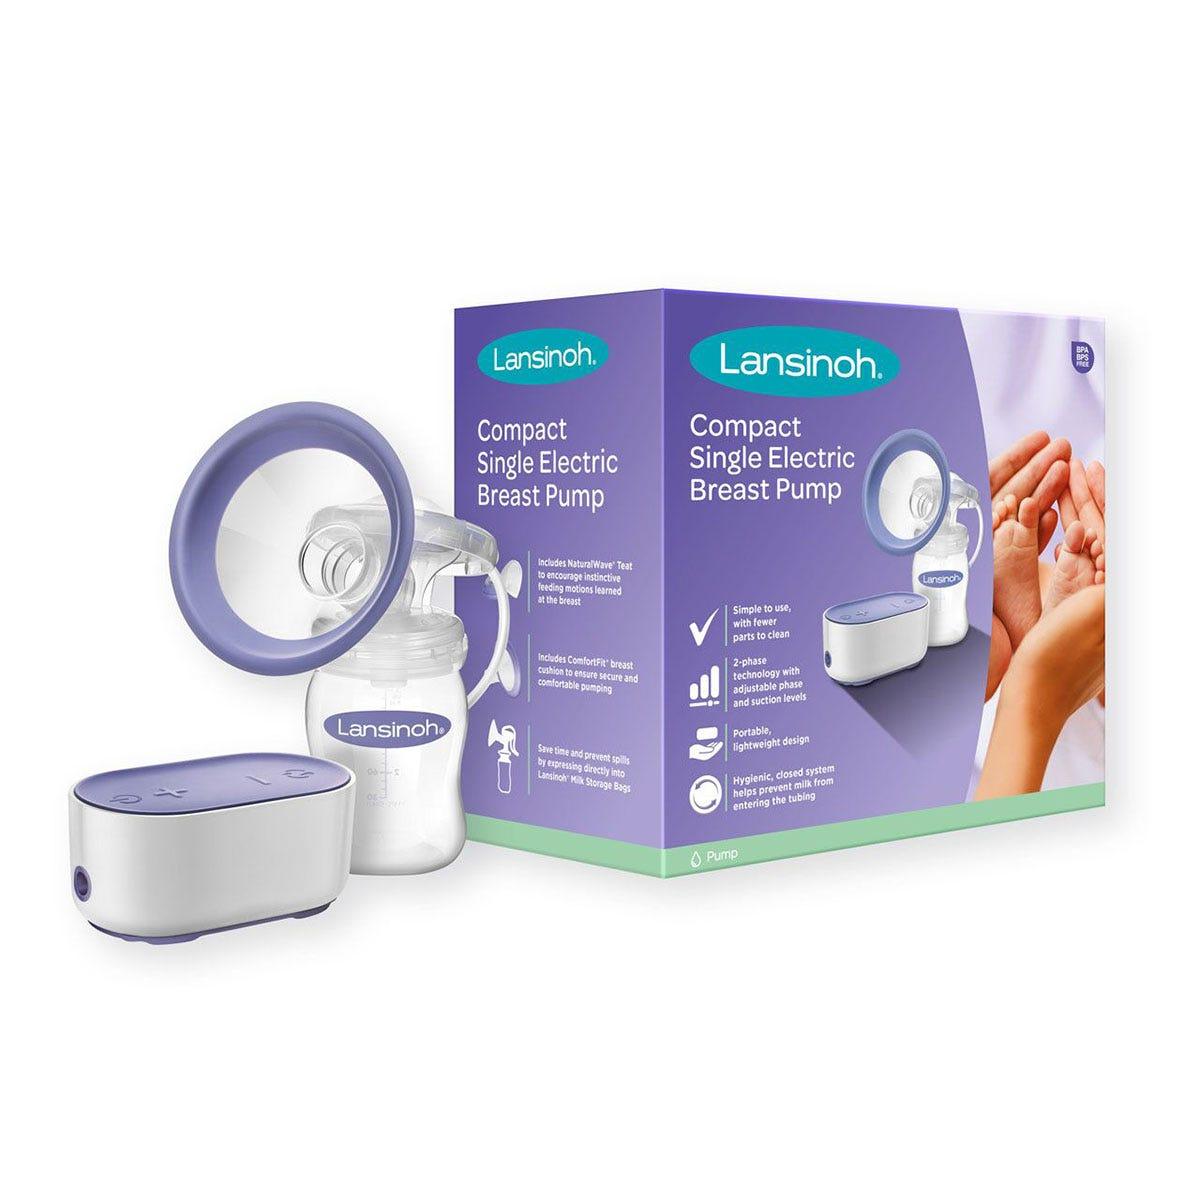 Lansinoh LN54091 Compact Electric Breast Pump - Purple & White